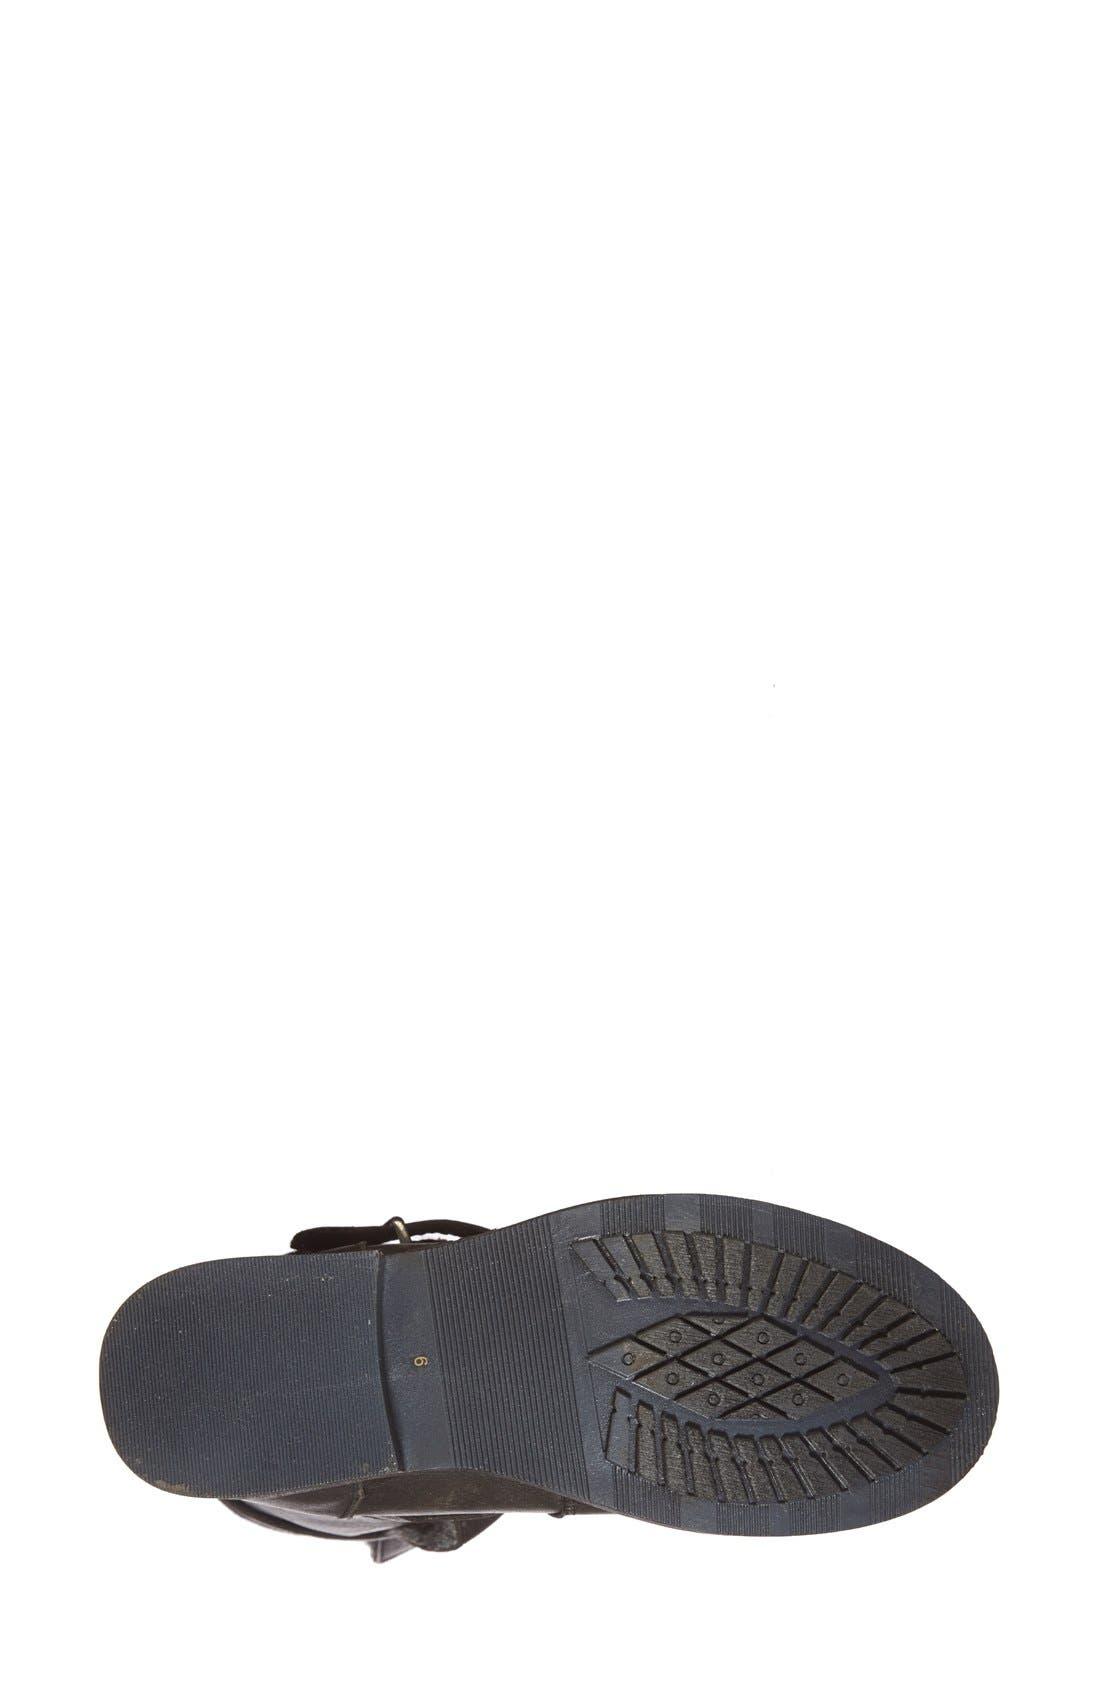 'Caveat' Moto Boot,                             Alternate thumbnail 4, color,                             050